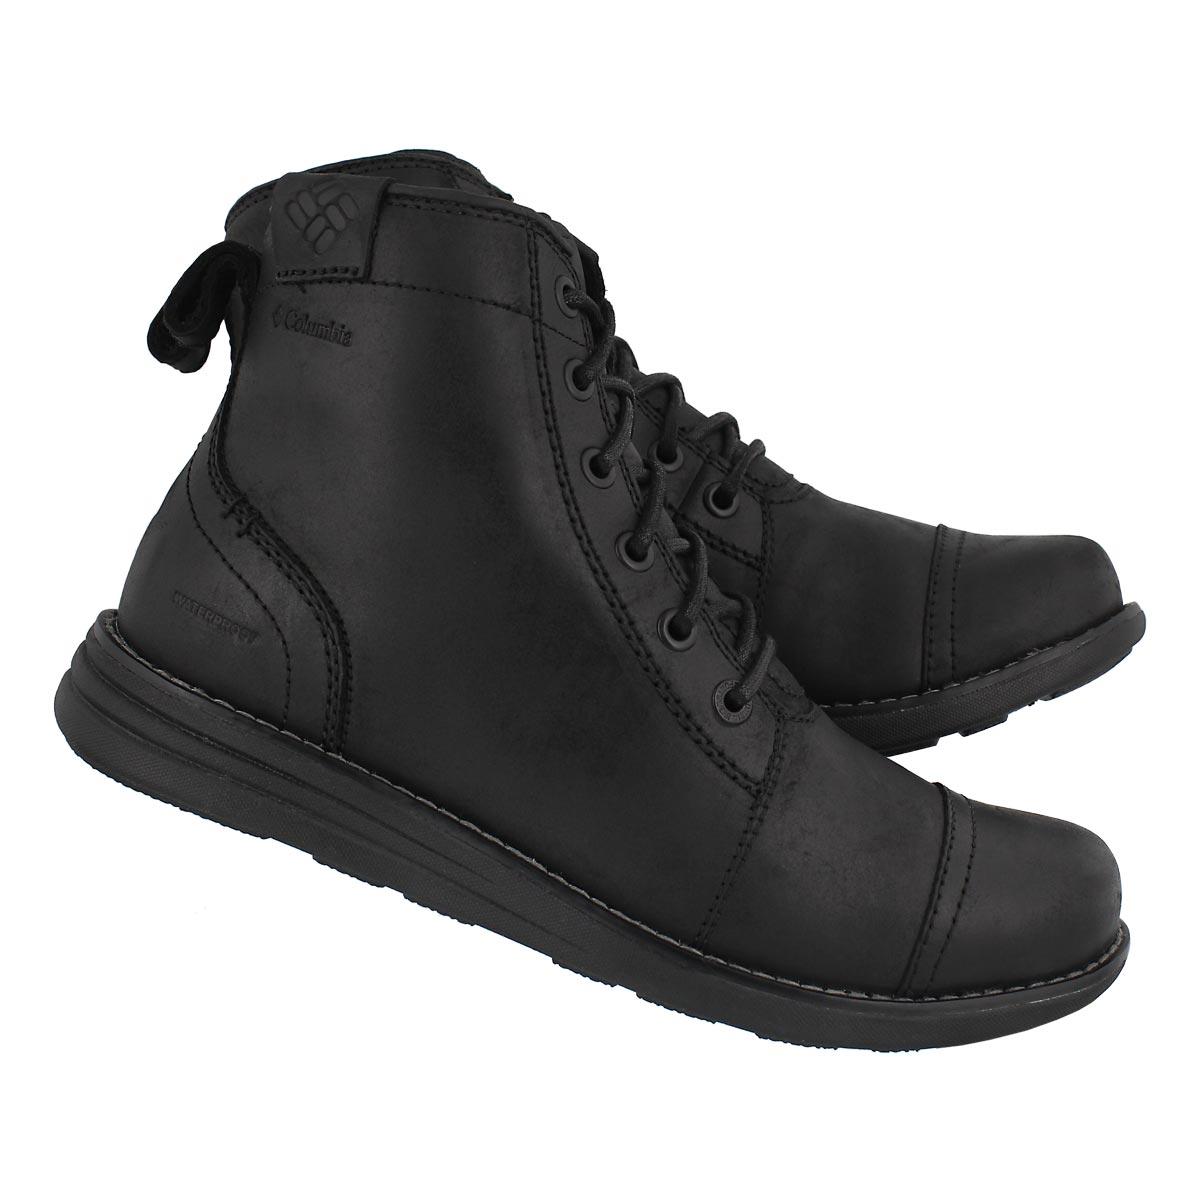 Mns Irvington LTR XTM blk wtpf boot